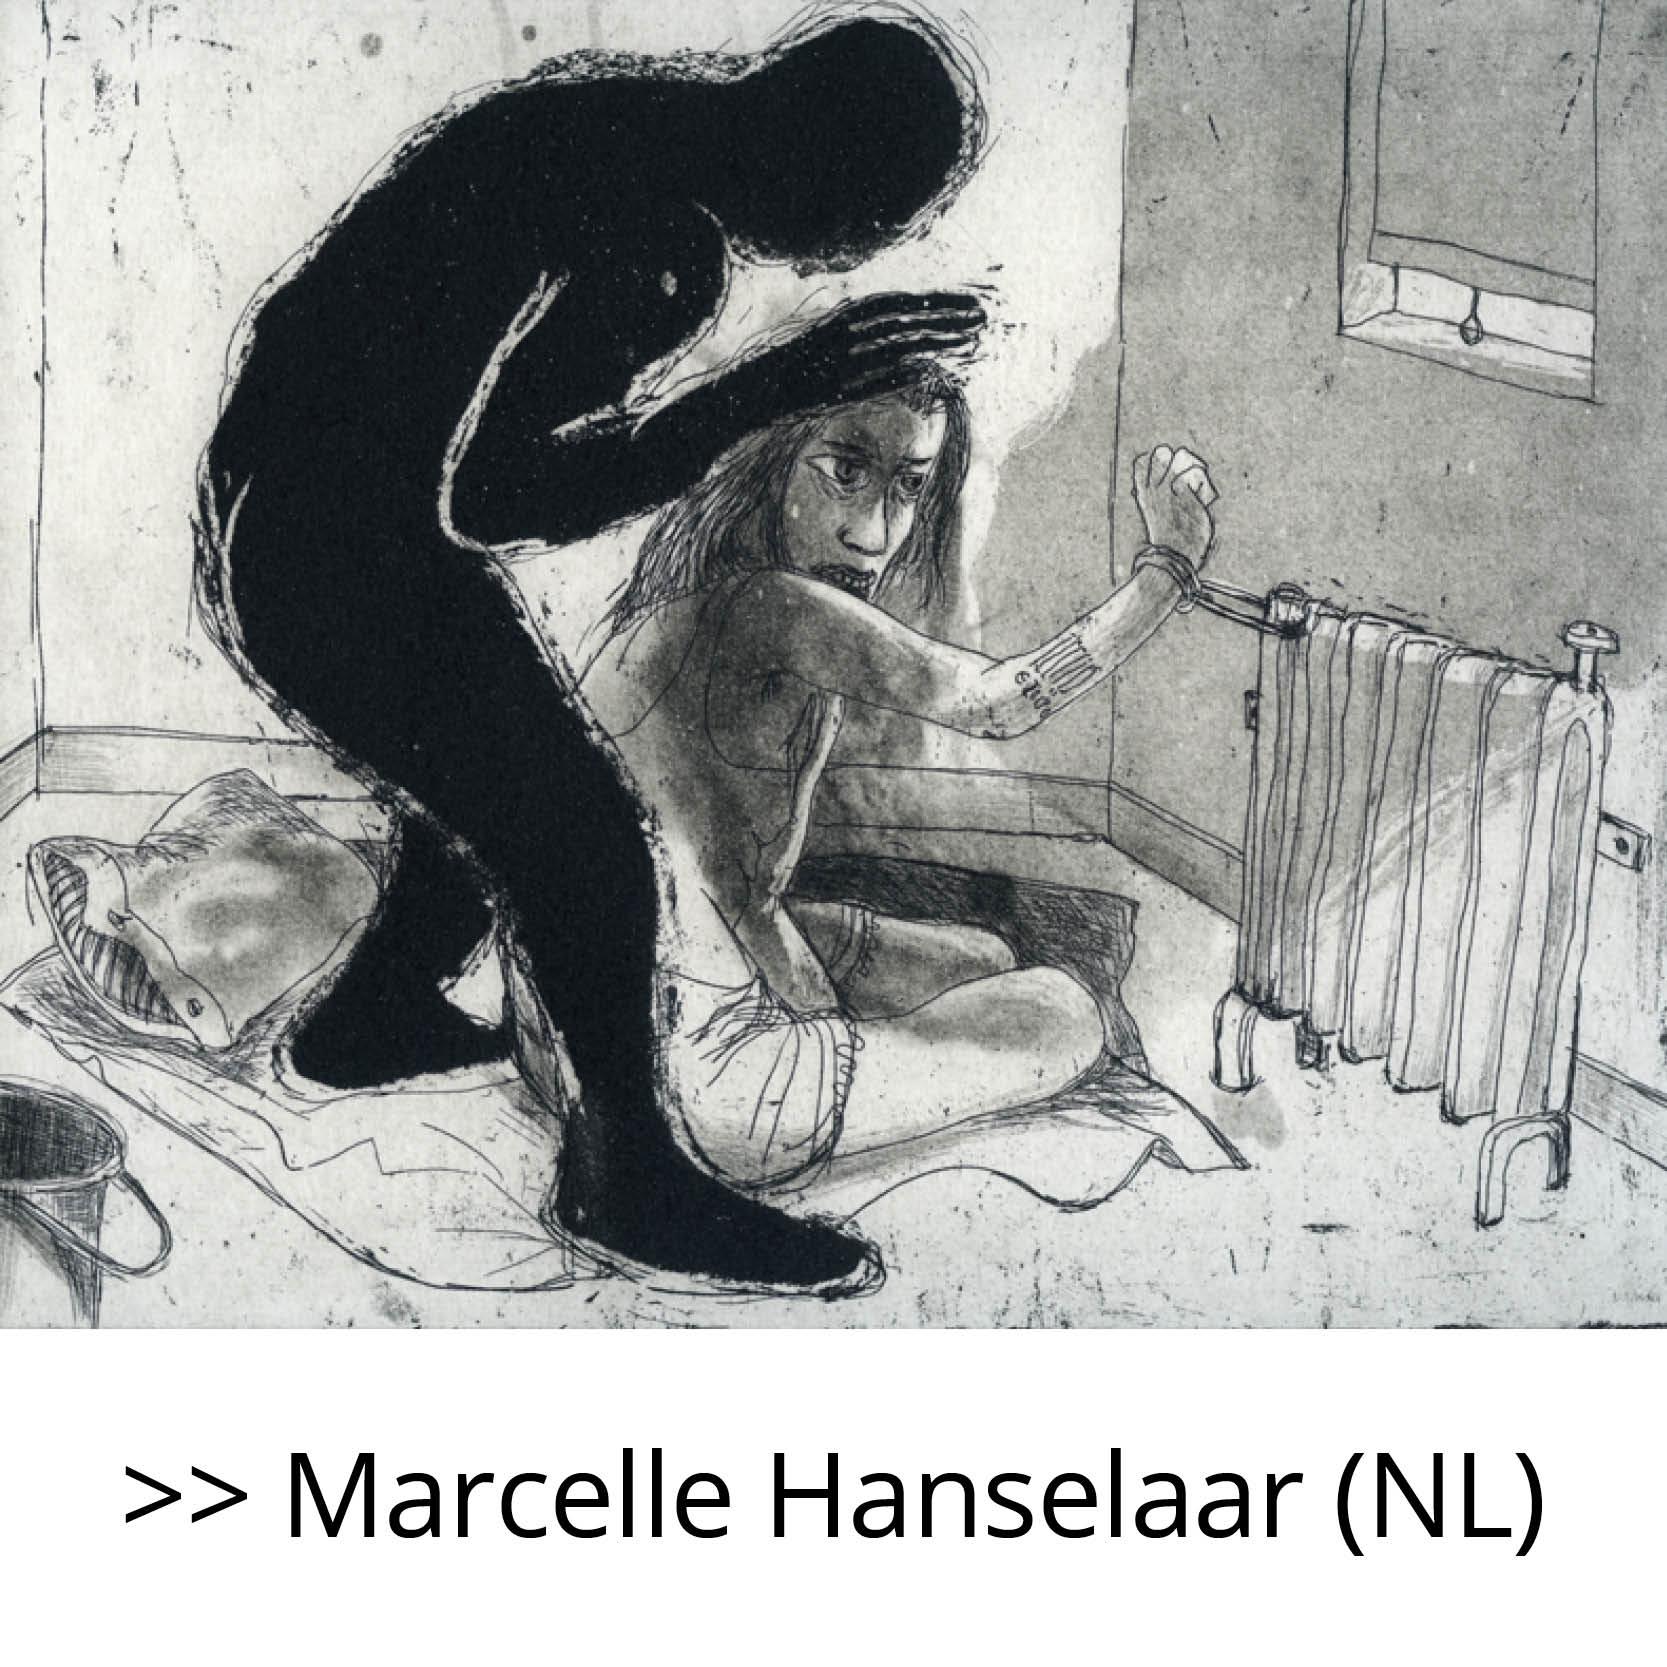 Marcelle_Hanselaar_(NL)